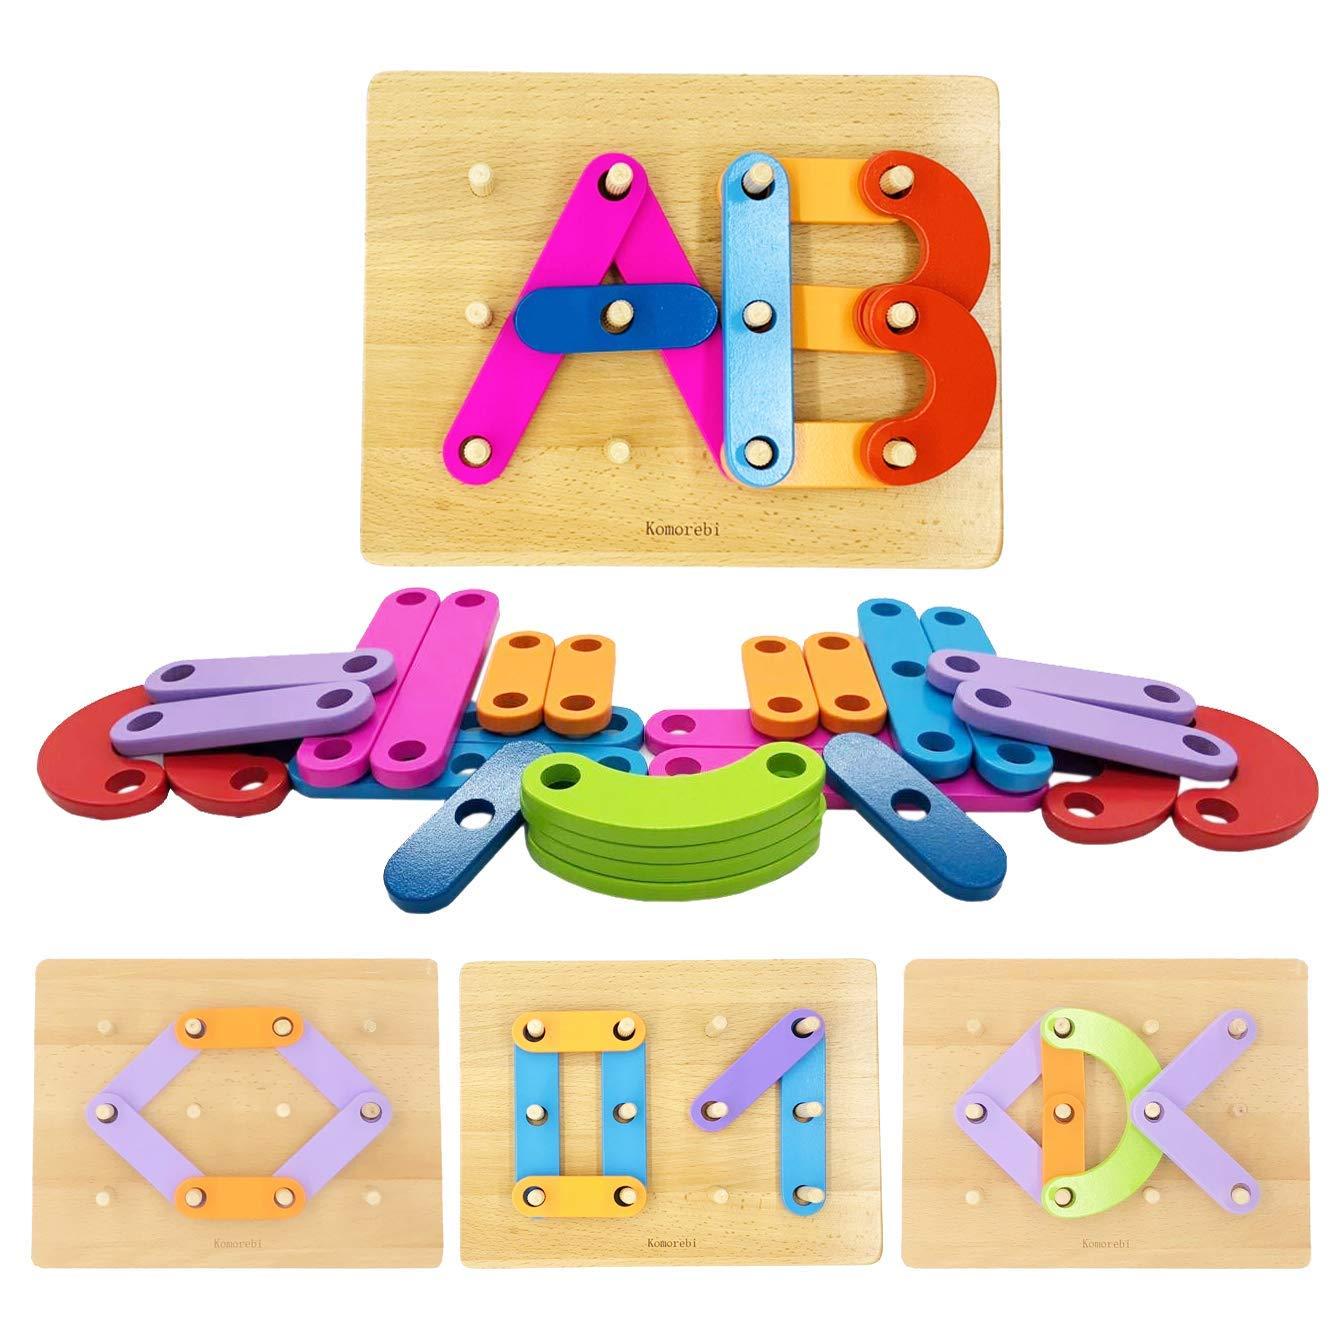 Komorebi 文字ナンバー形状 パターン 組み立ておもちゃ 色認識 子供用 アルファベット ブロック 積み重ね 仕分け 幼稚園 教育玩具 セット 女の子と男の子用 2歳~5歳   B07LFQYV8Q